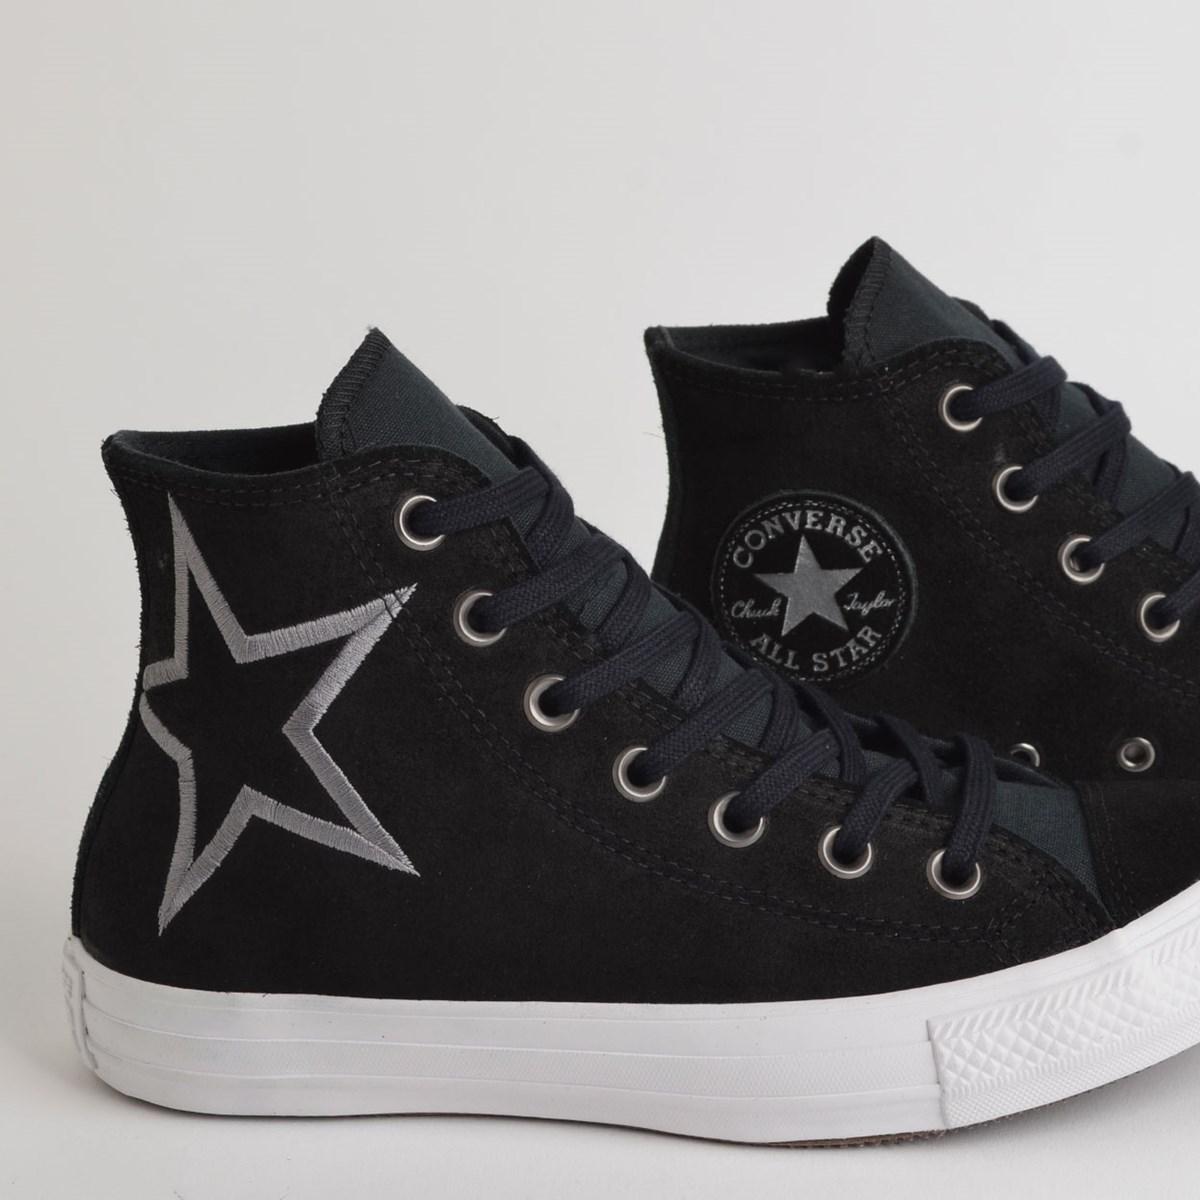 Tênis Converse Chuck Taylor All Star Hi Preto Cinza Metalizado CT13290001